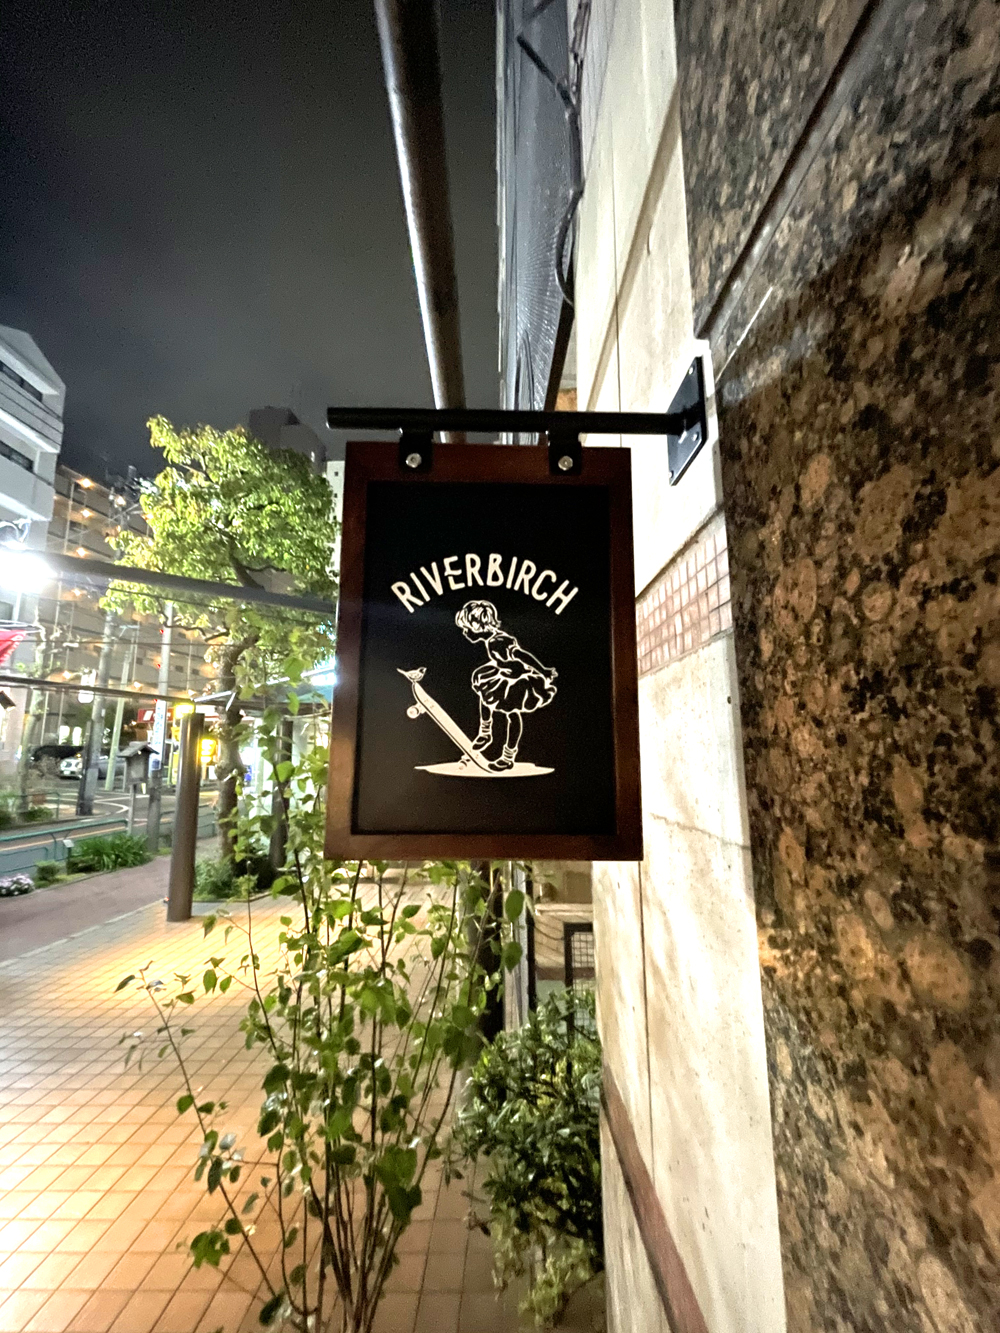 RIVERBIRCH スケートショップ 西荻窪 吉田サトル